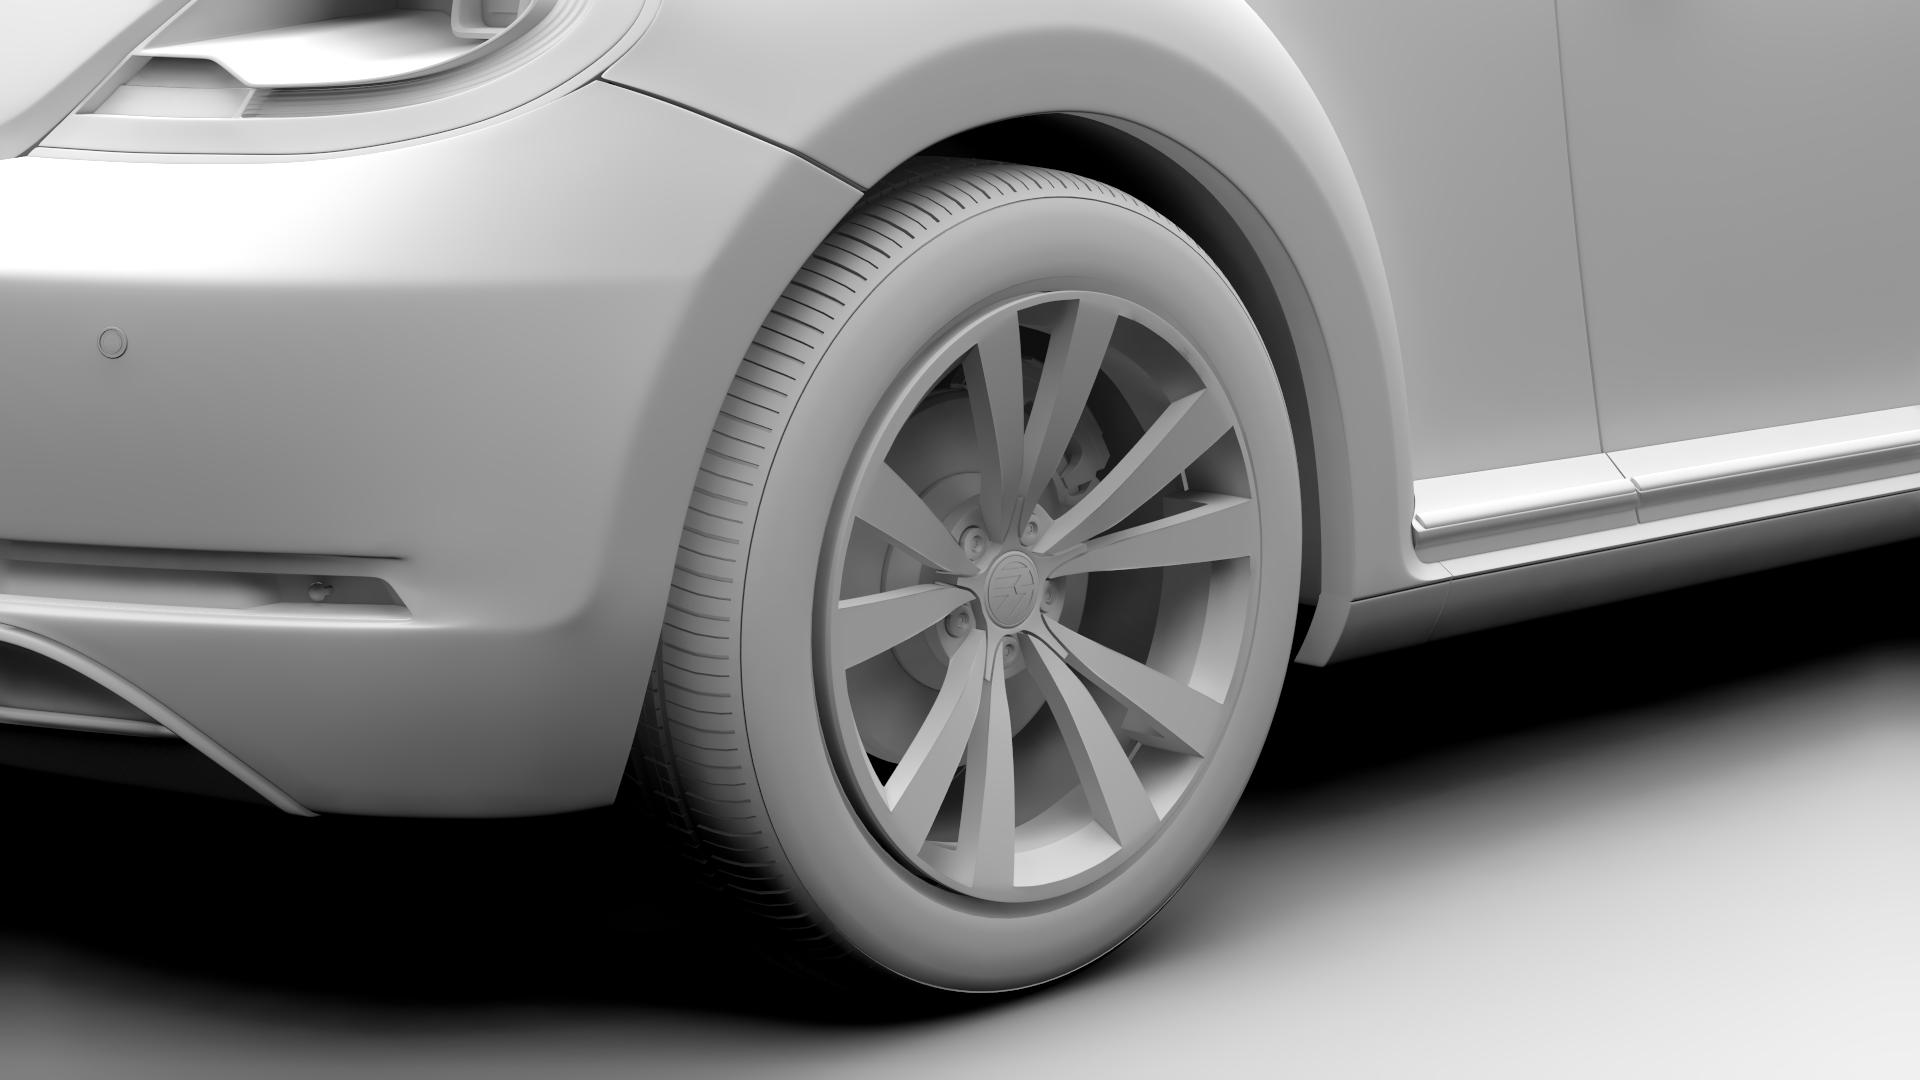 vw beetle cabriolet 2017 3d model 3ds max fbx c4d lwo ma mb hrc xsi obj 221601